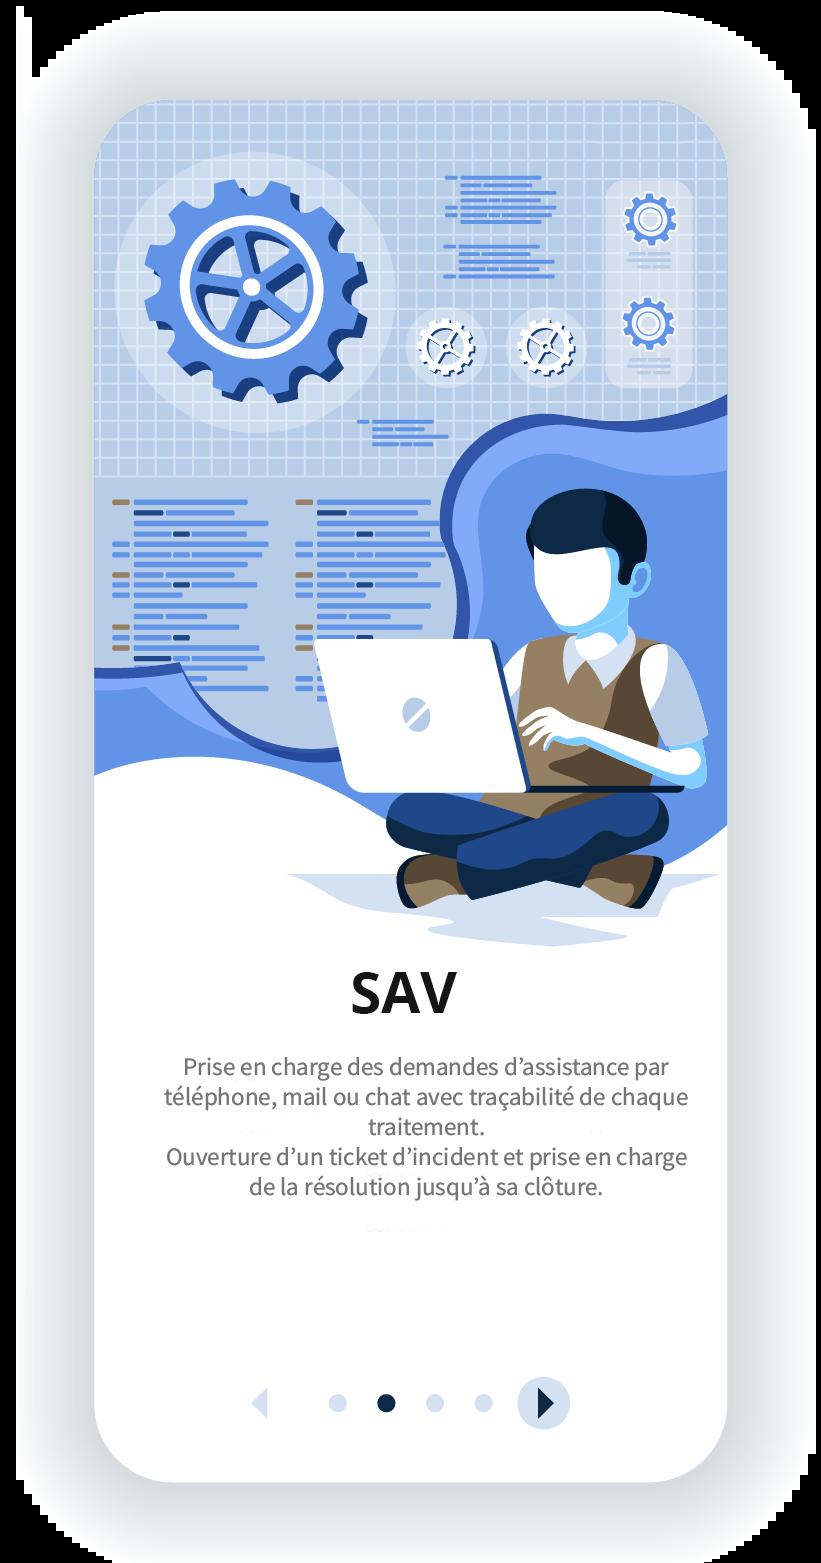 3_SAV-1_n